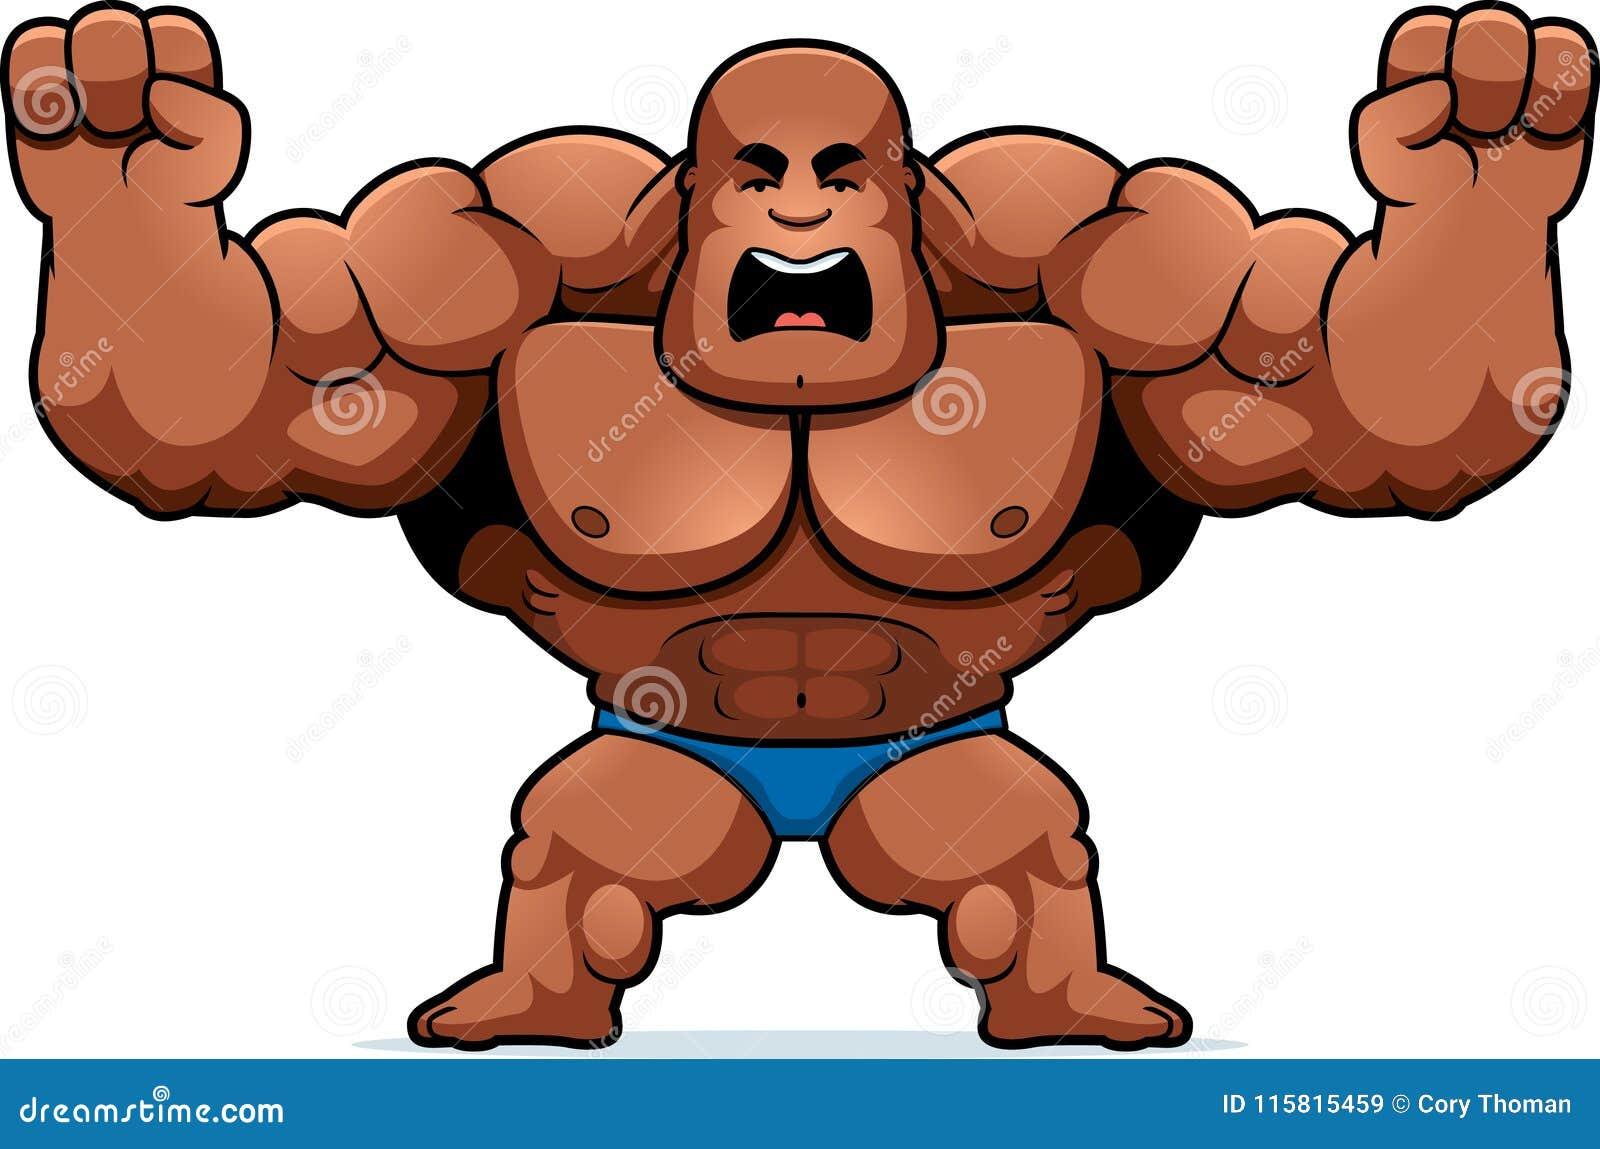 Cartoon Bodybuilder Angry Stock Vector Illustration Of Cartoon 115815459